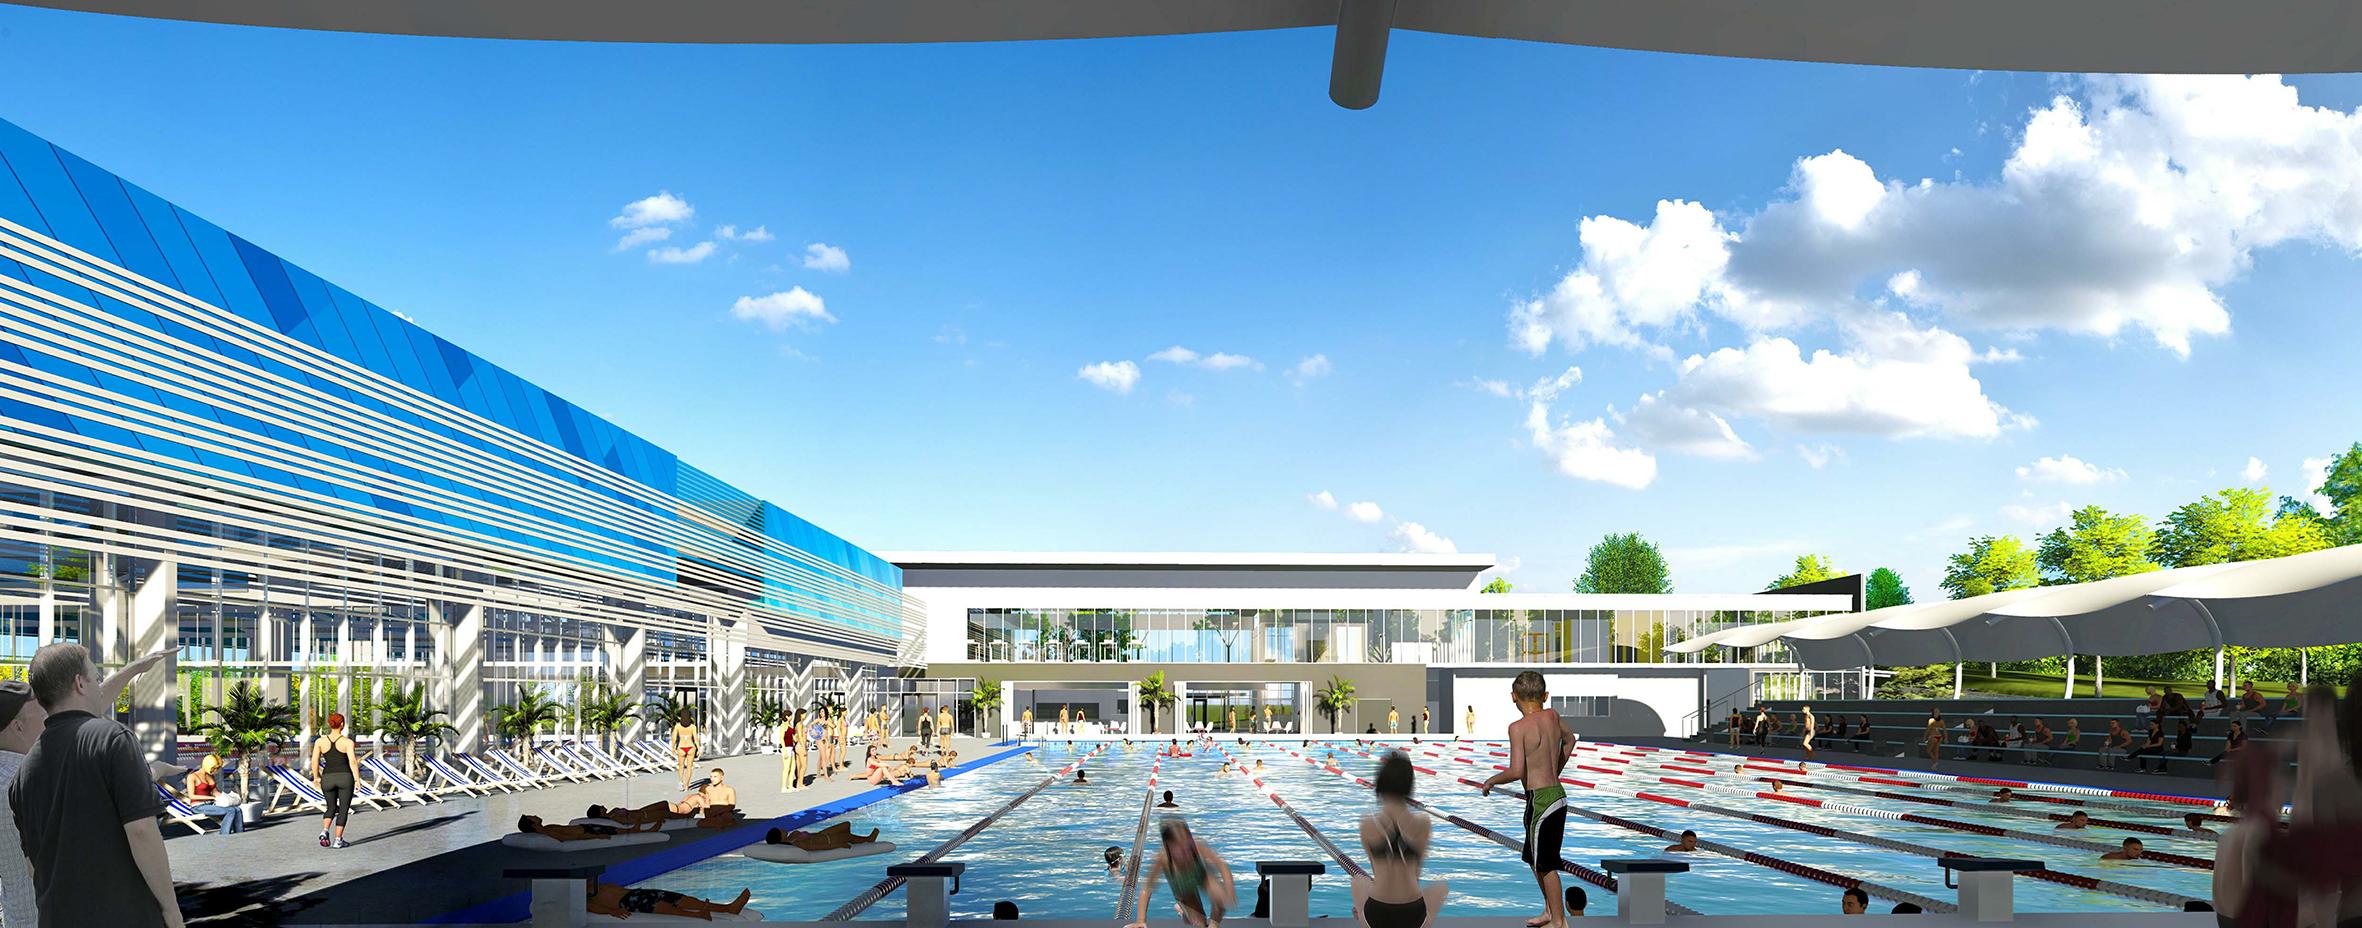 Swim Centres Lake Macquarie